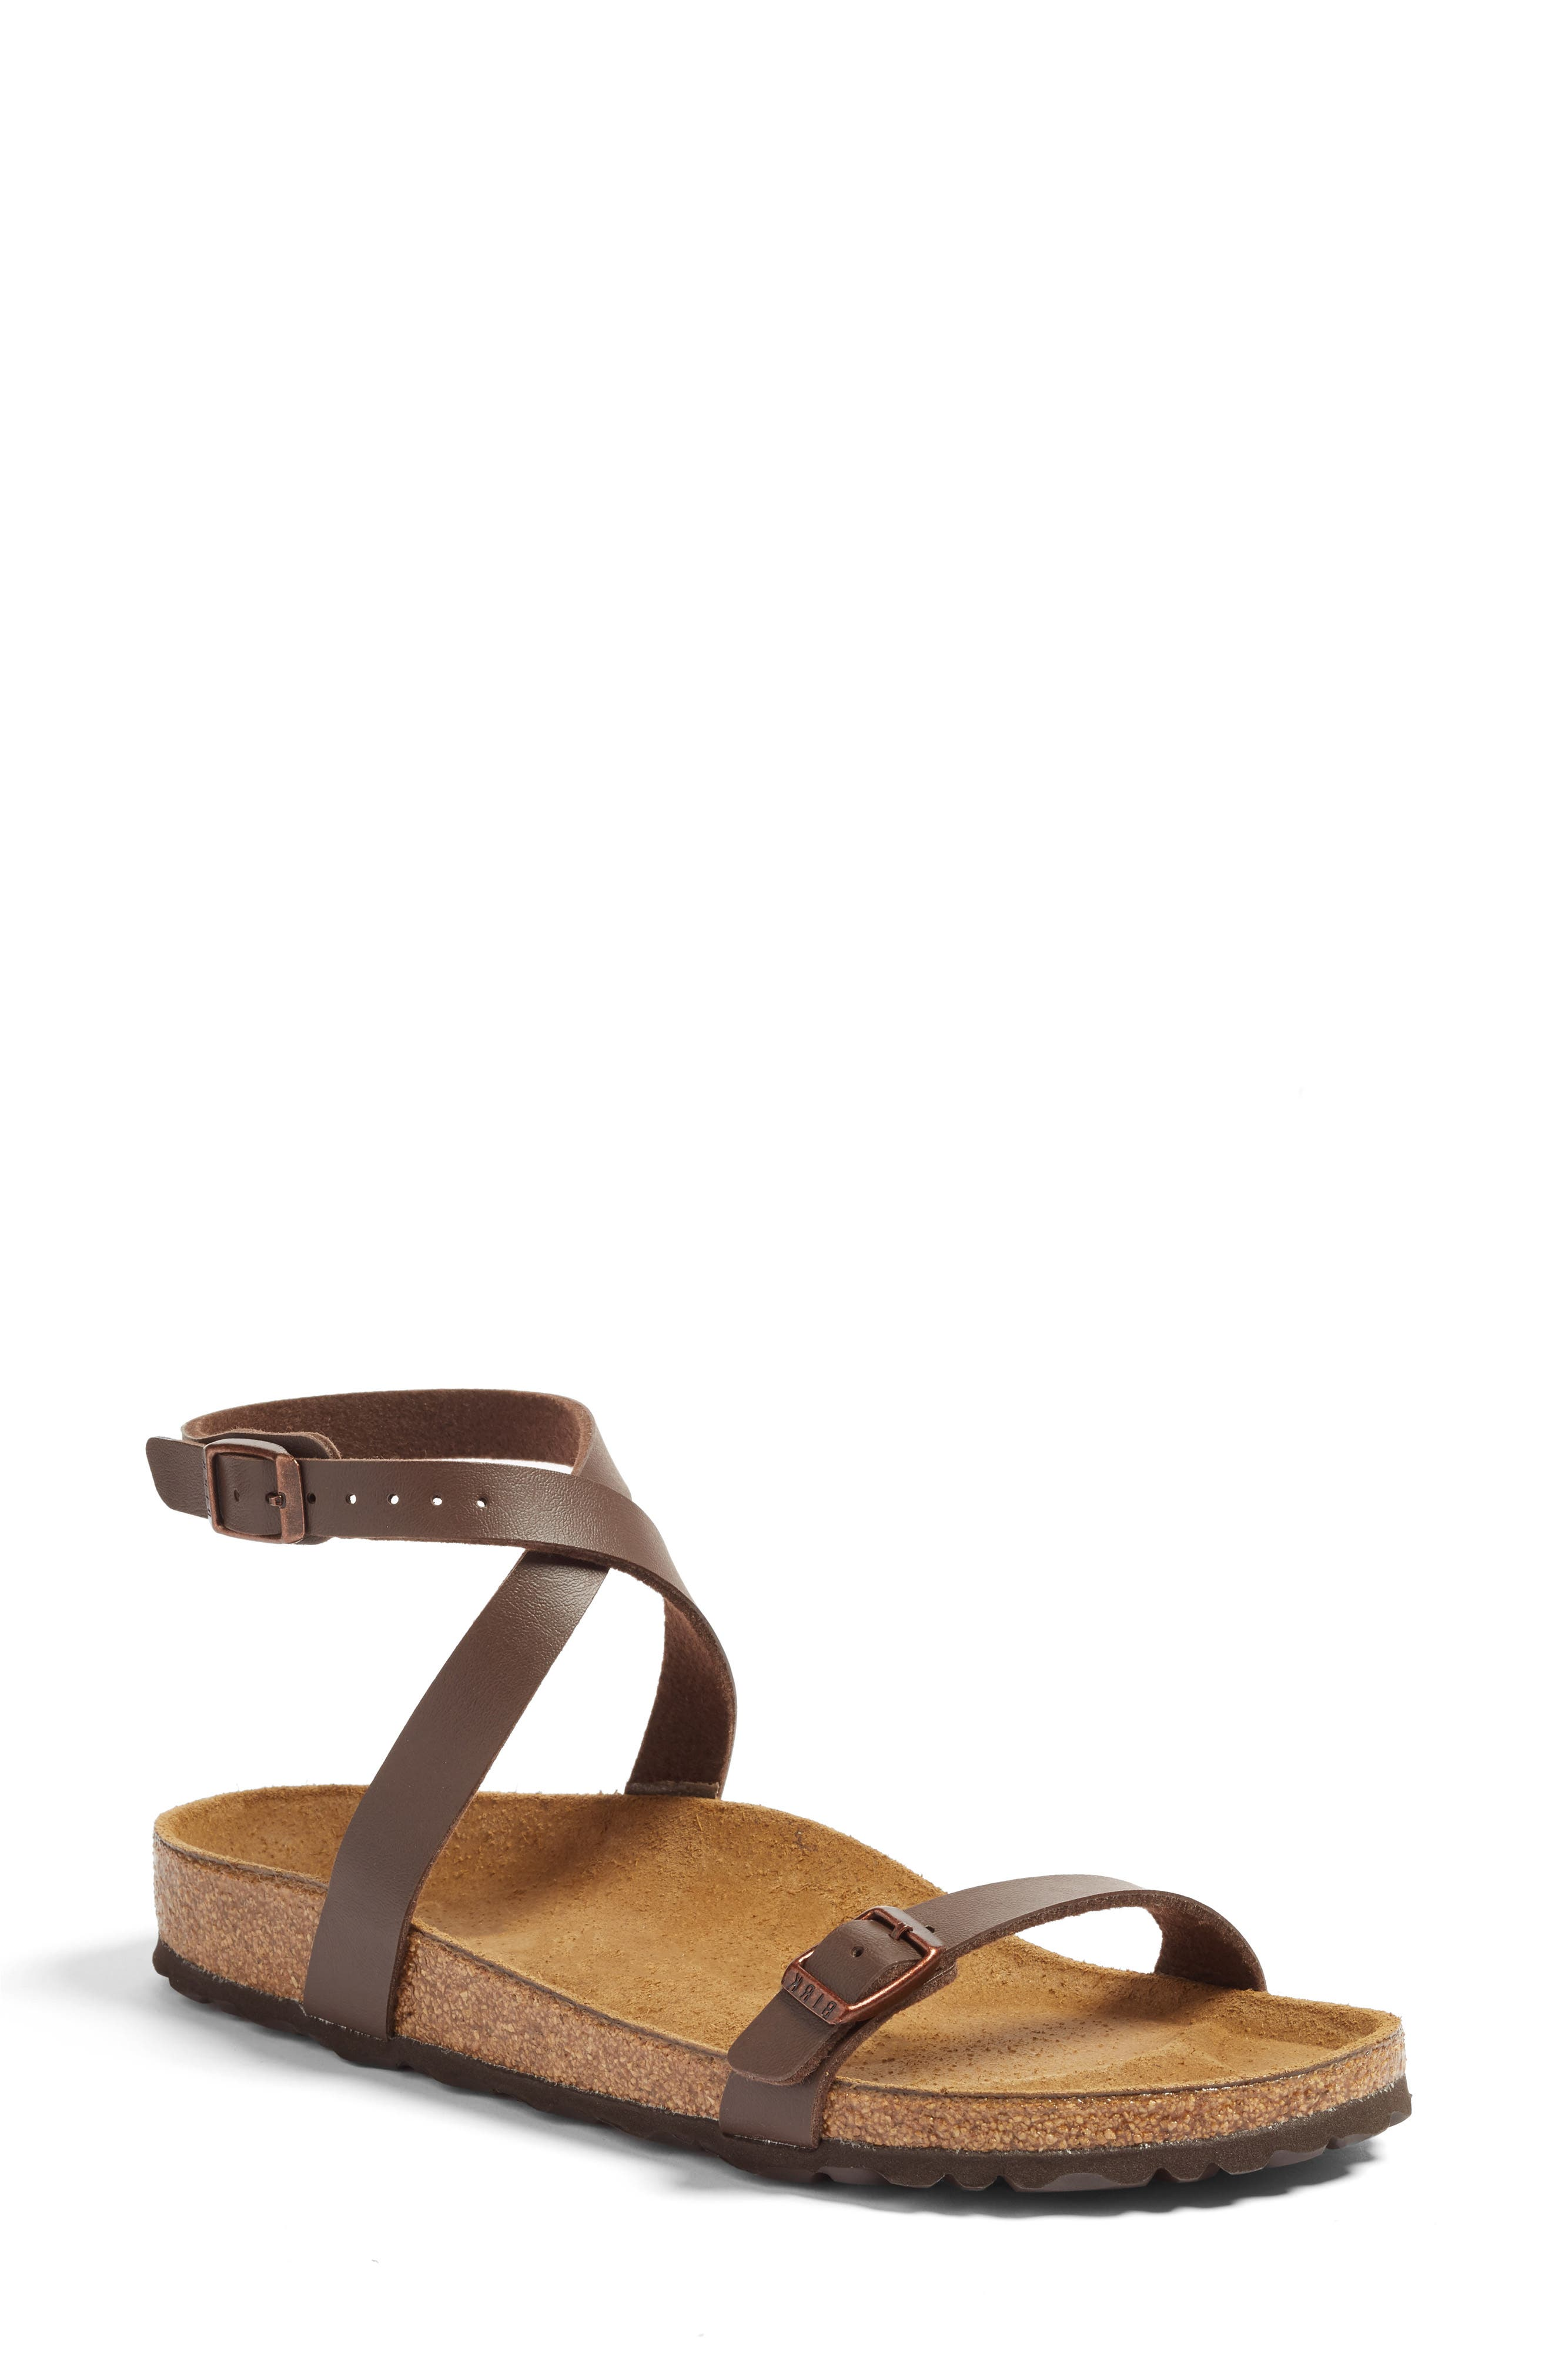 Daloa Ankle Strap Sandal,                         Main,                         color, MOCHA